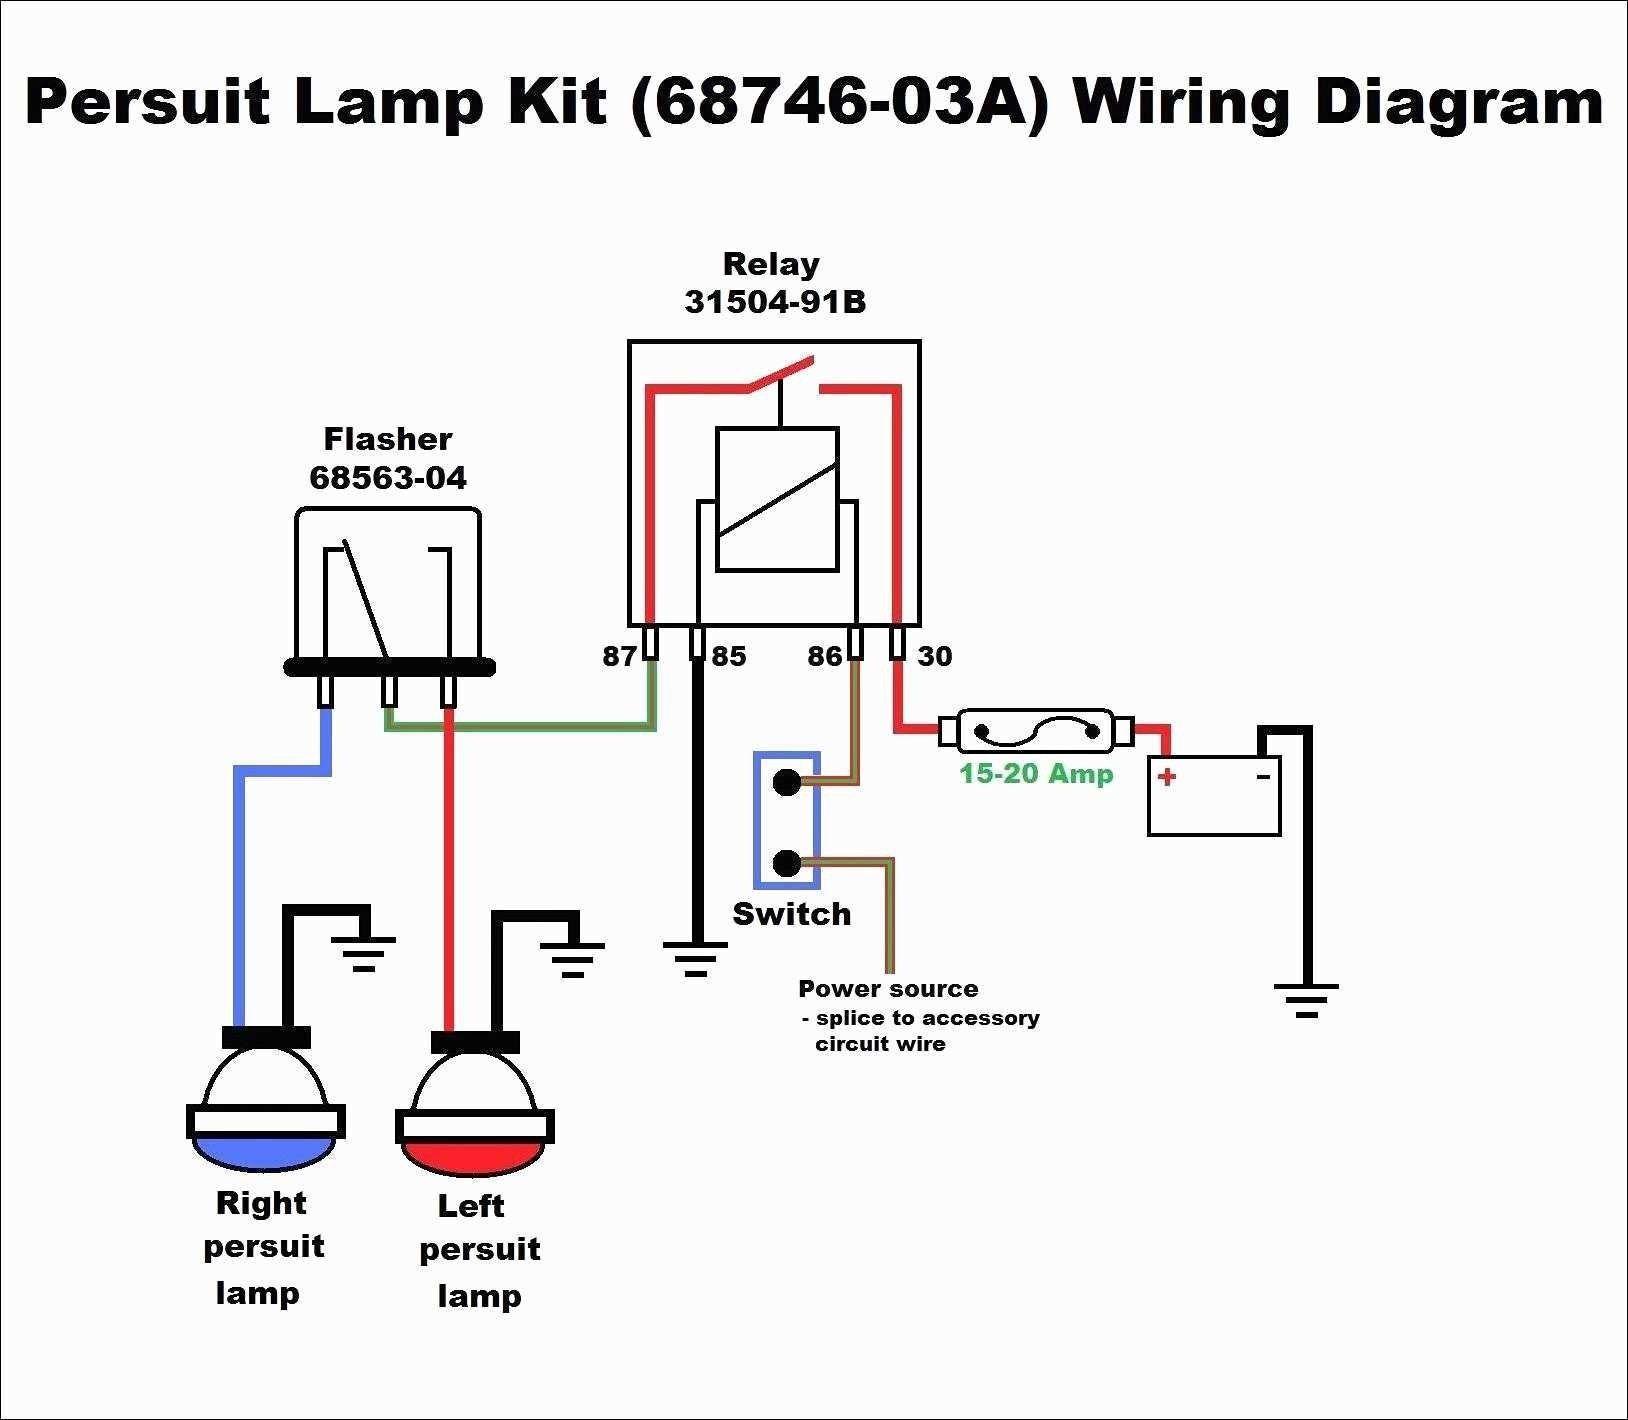 Diagramtemplate Diagramformats Diagramsample Capacitor Diagram Unique Wiring Audio Carunique Wi Diagram Light Switch Wiring Electrical Circuit Diagram